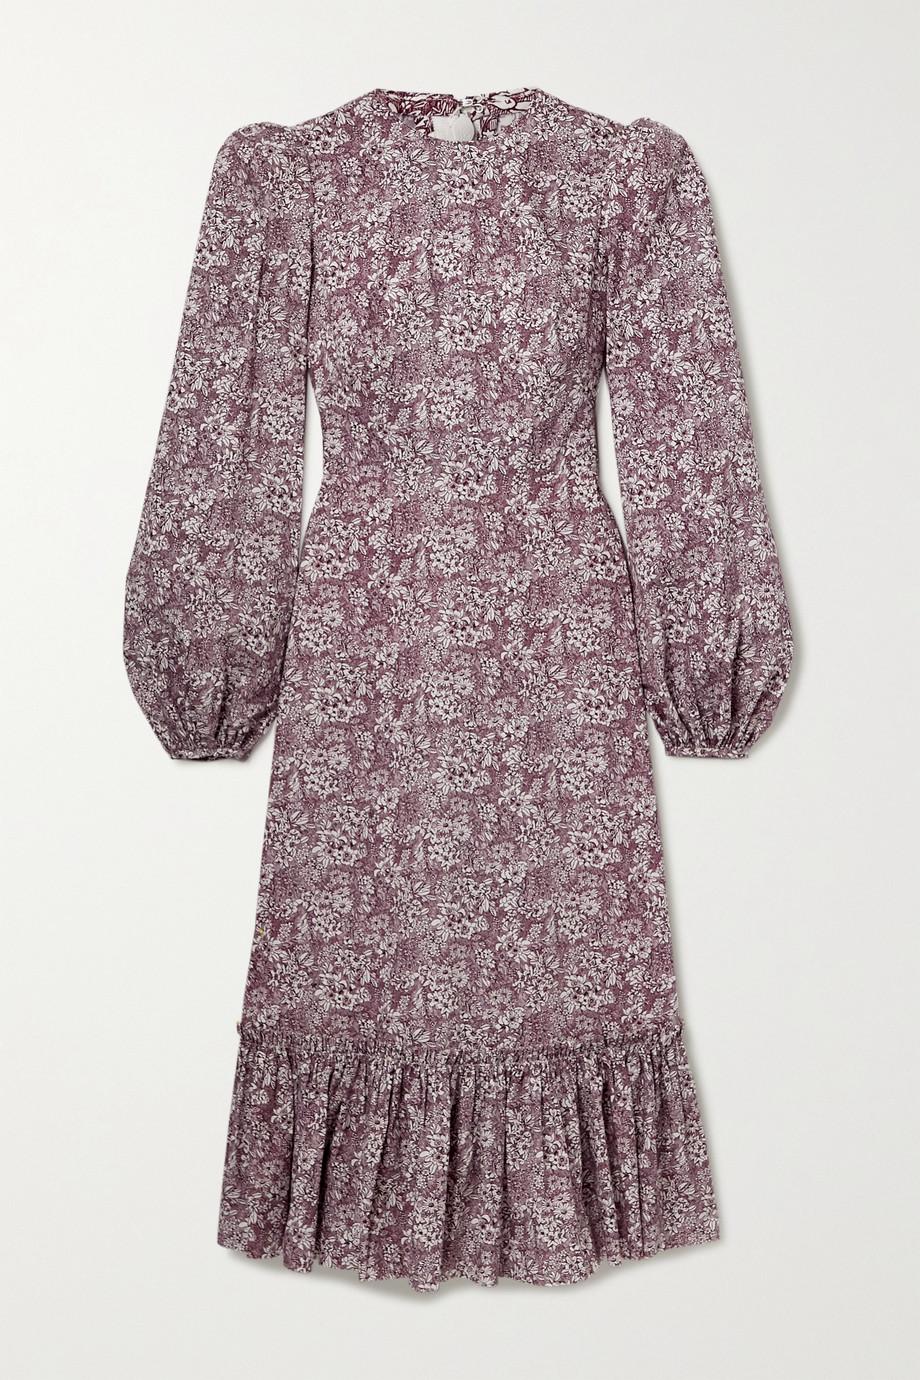 The Vampire's Wife | Belle tiered floral-print cotton-poplin midi dress | NET-A-PORTER.COM